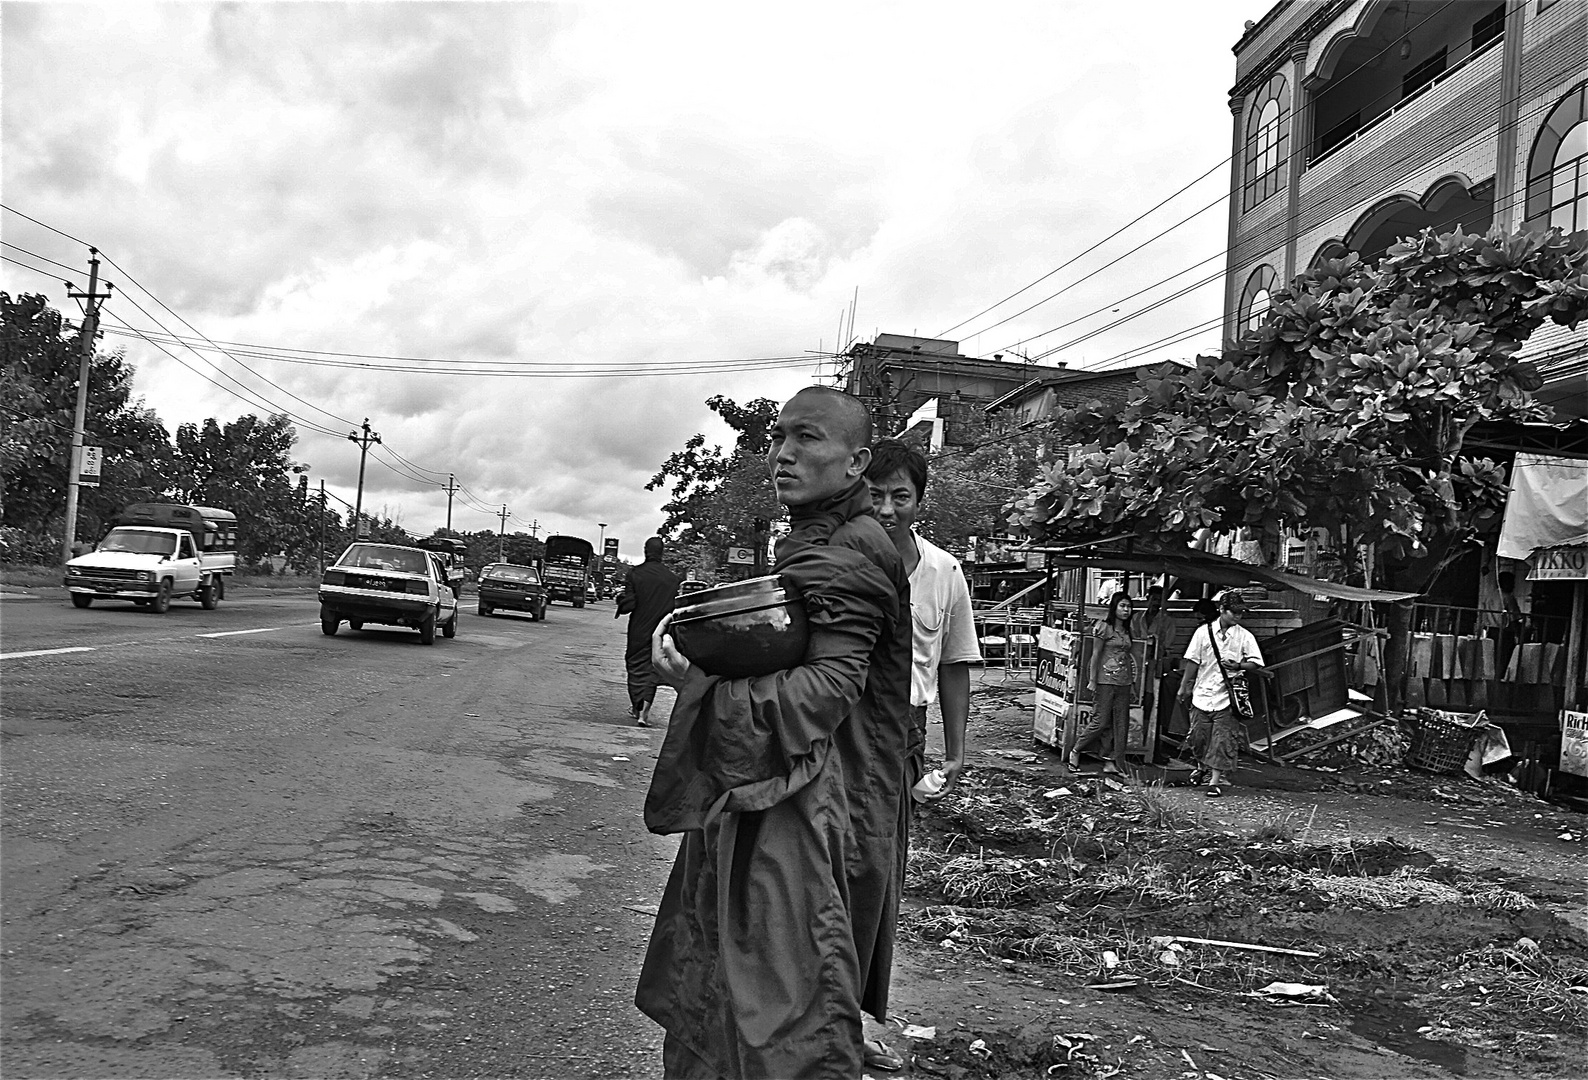 yangon ausfahrtsstrasse, burma 2011